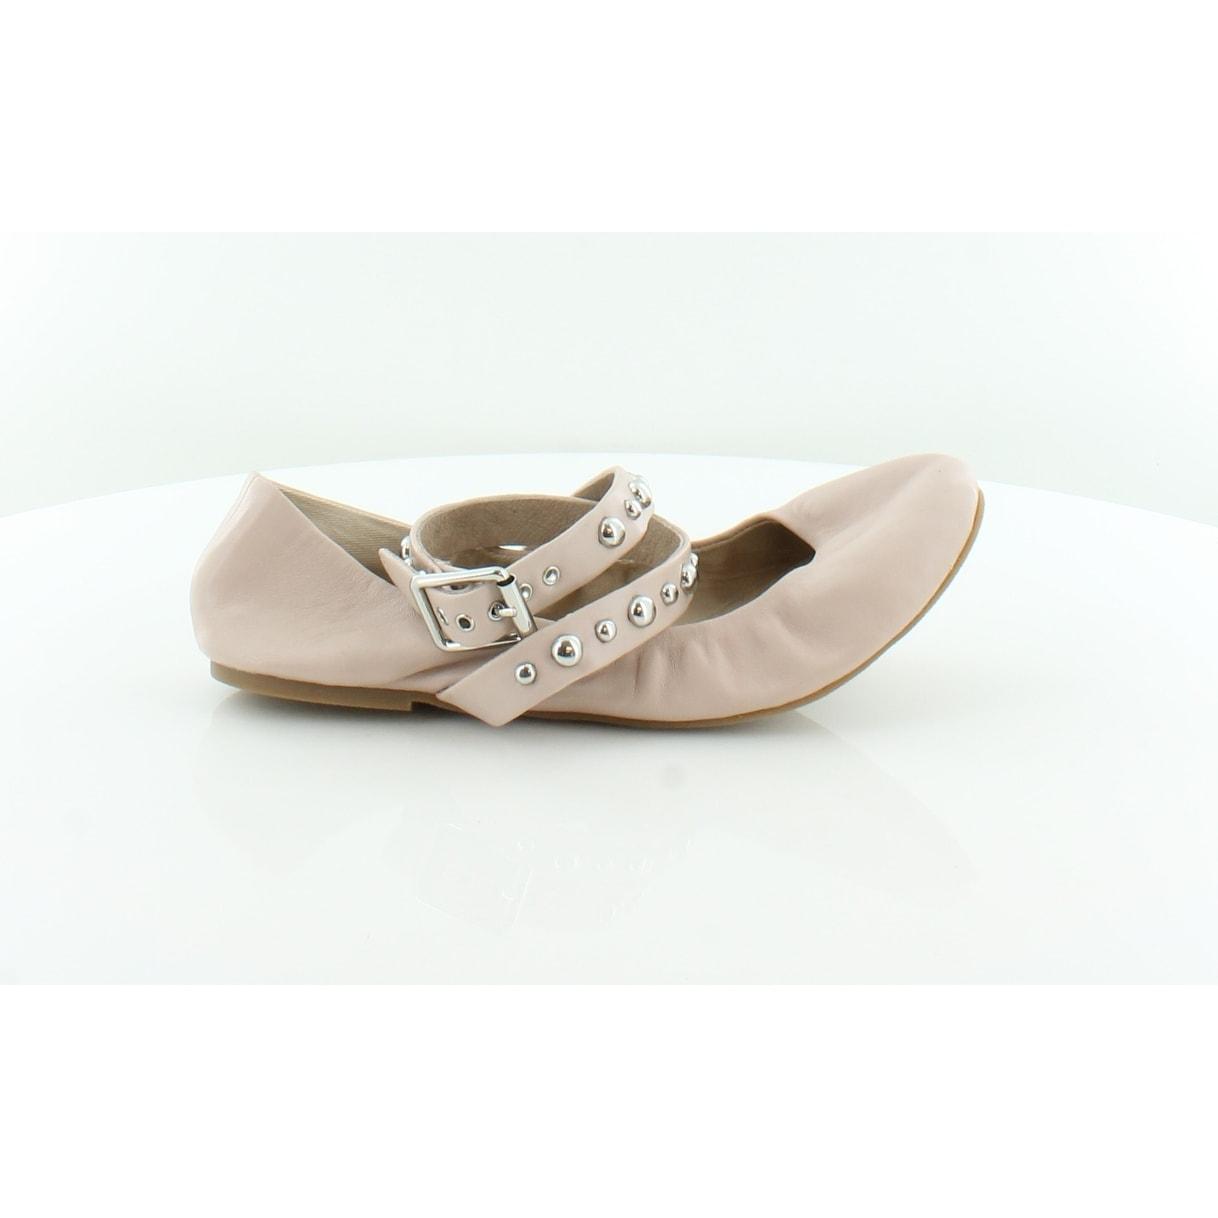 da0a43bf37d Shop Steve Madden Mollie Women s FLATS Blush - Free Shipping On Orders Over   45 - Overstock - 21551045